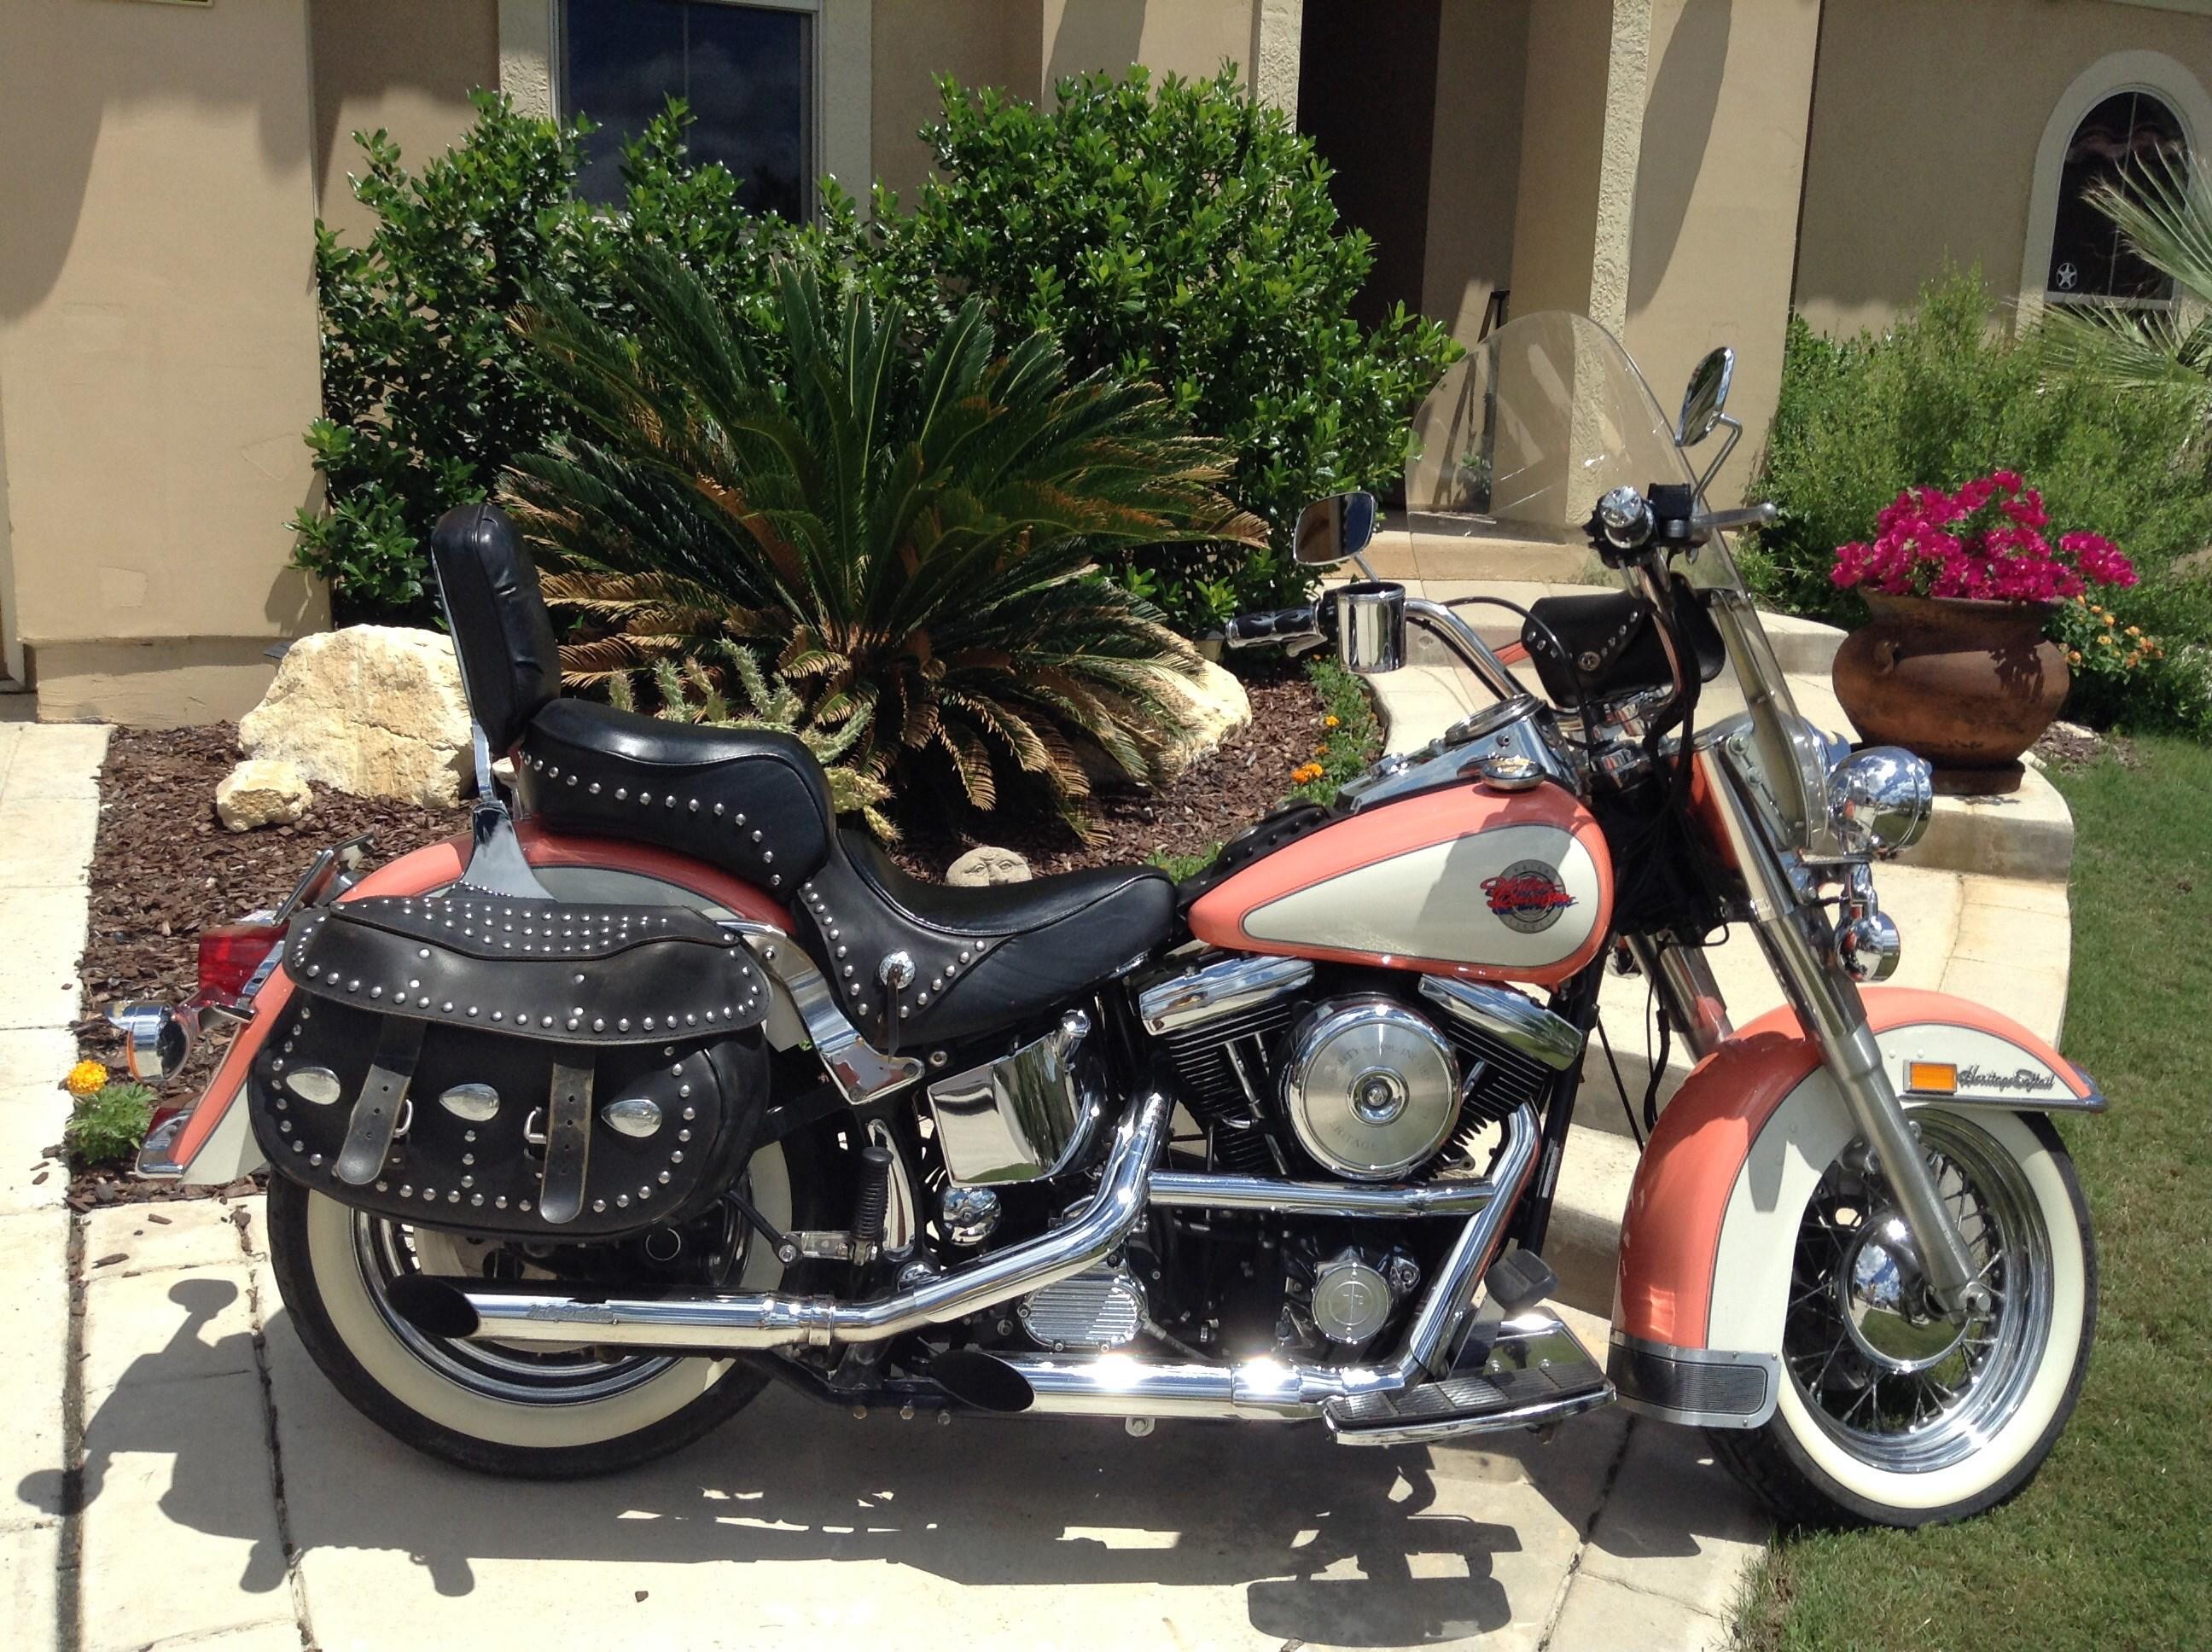 1992 Harley DavidsonR FLSTC Heritage SoftailR Classic